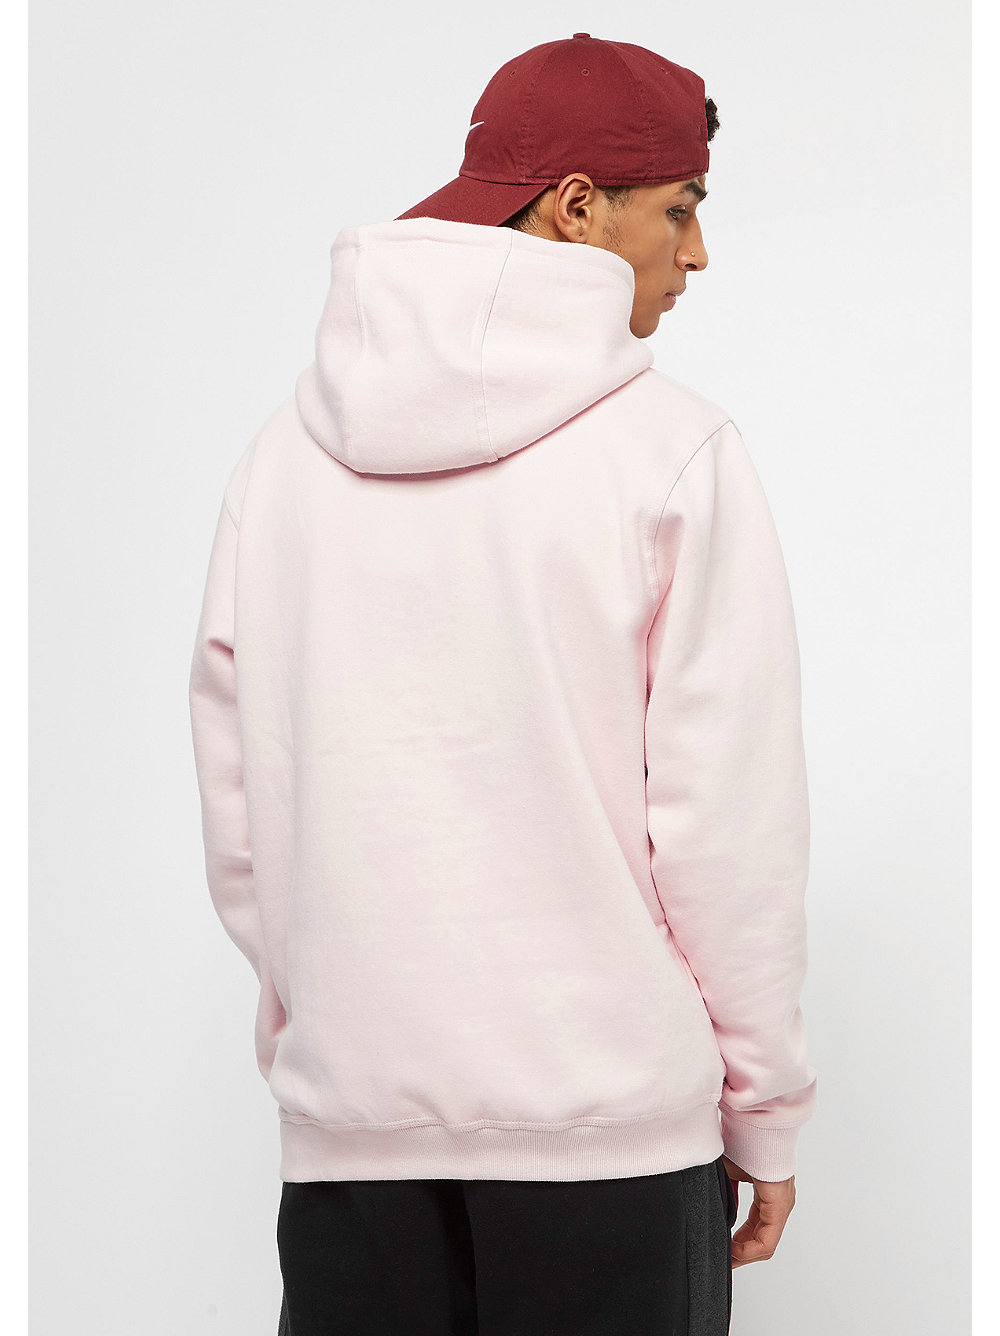 snipes hooded sweatshirt chest logo crystal pink white. Black Bedroom Furniture Sets. Home Design Ideas